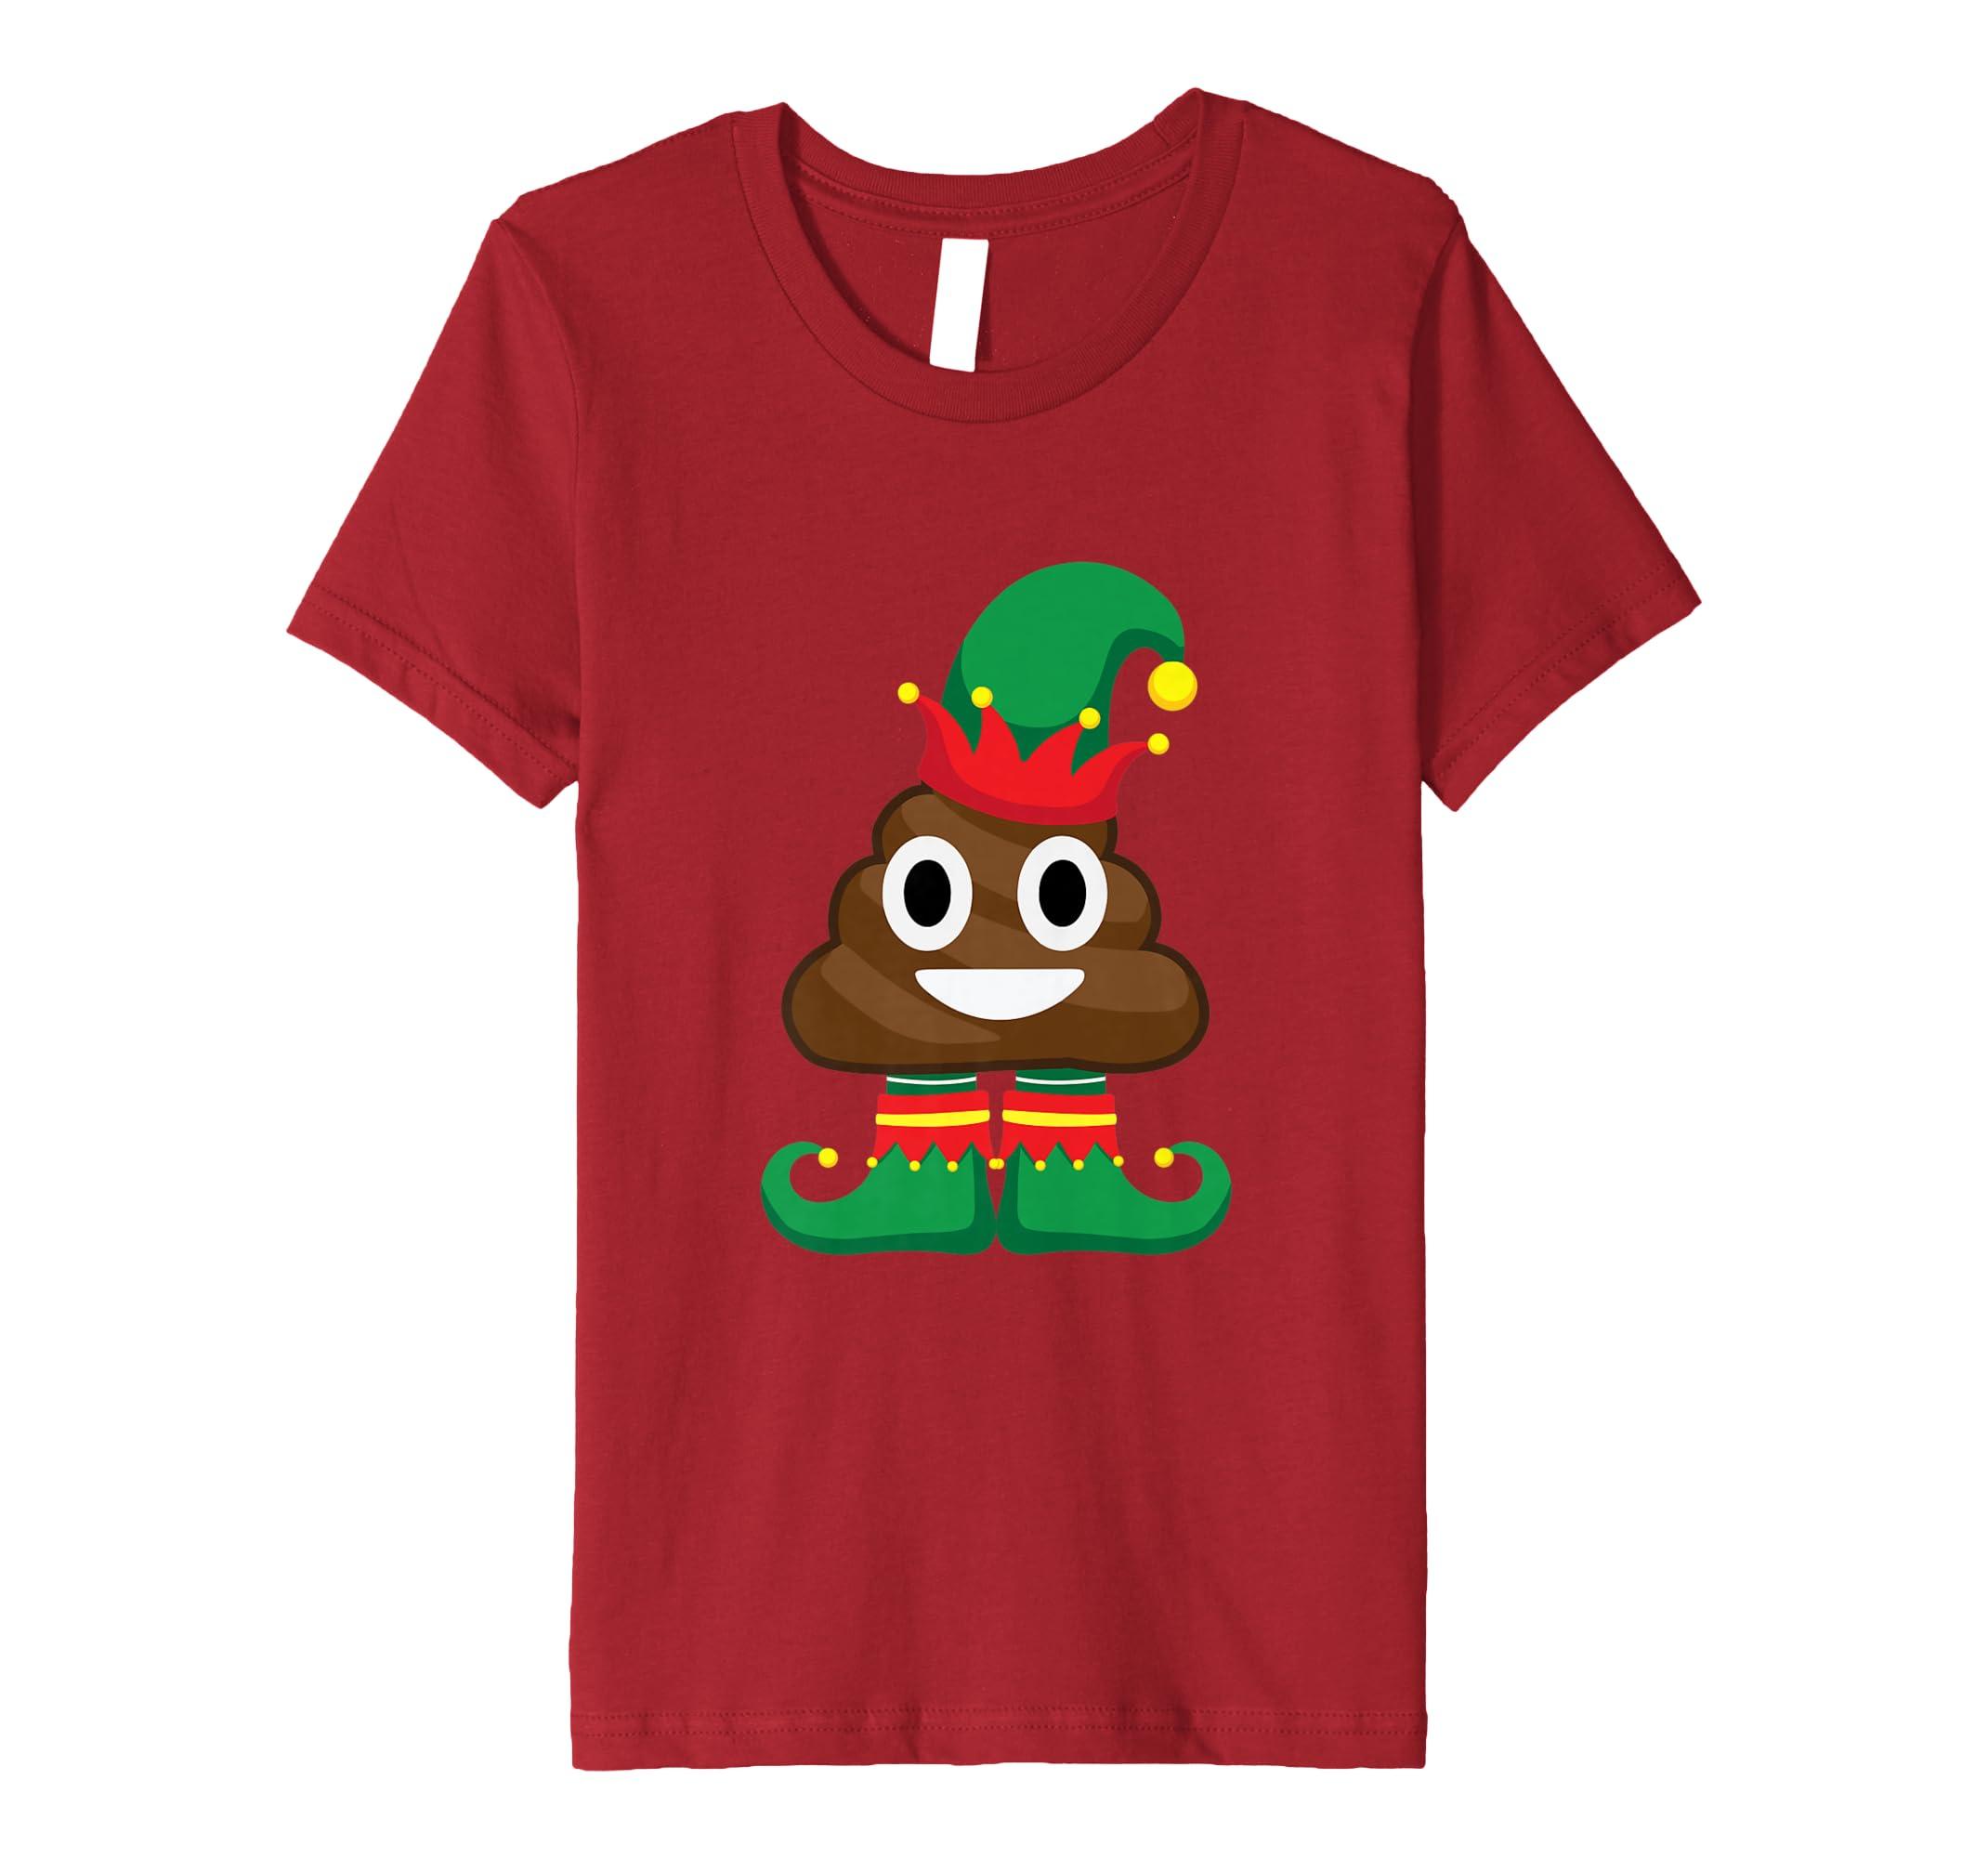 Elf Poop Emoji Shirt Lustiges Weihnachtshemd Poop Shirt: Amazon.de ...